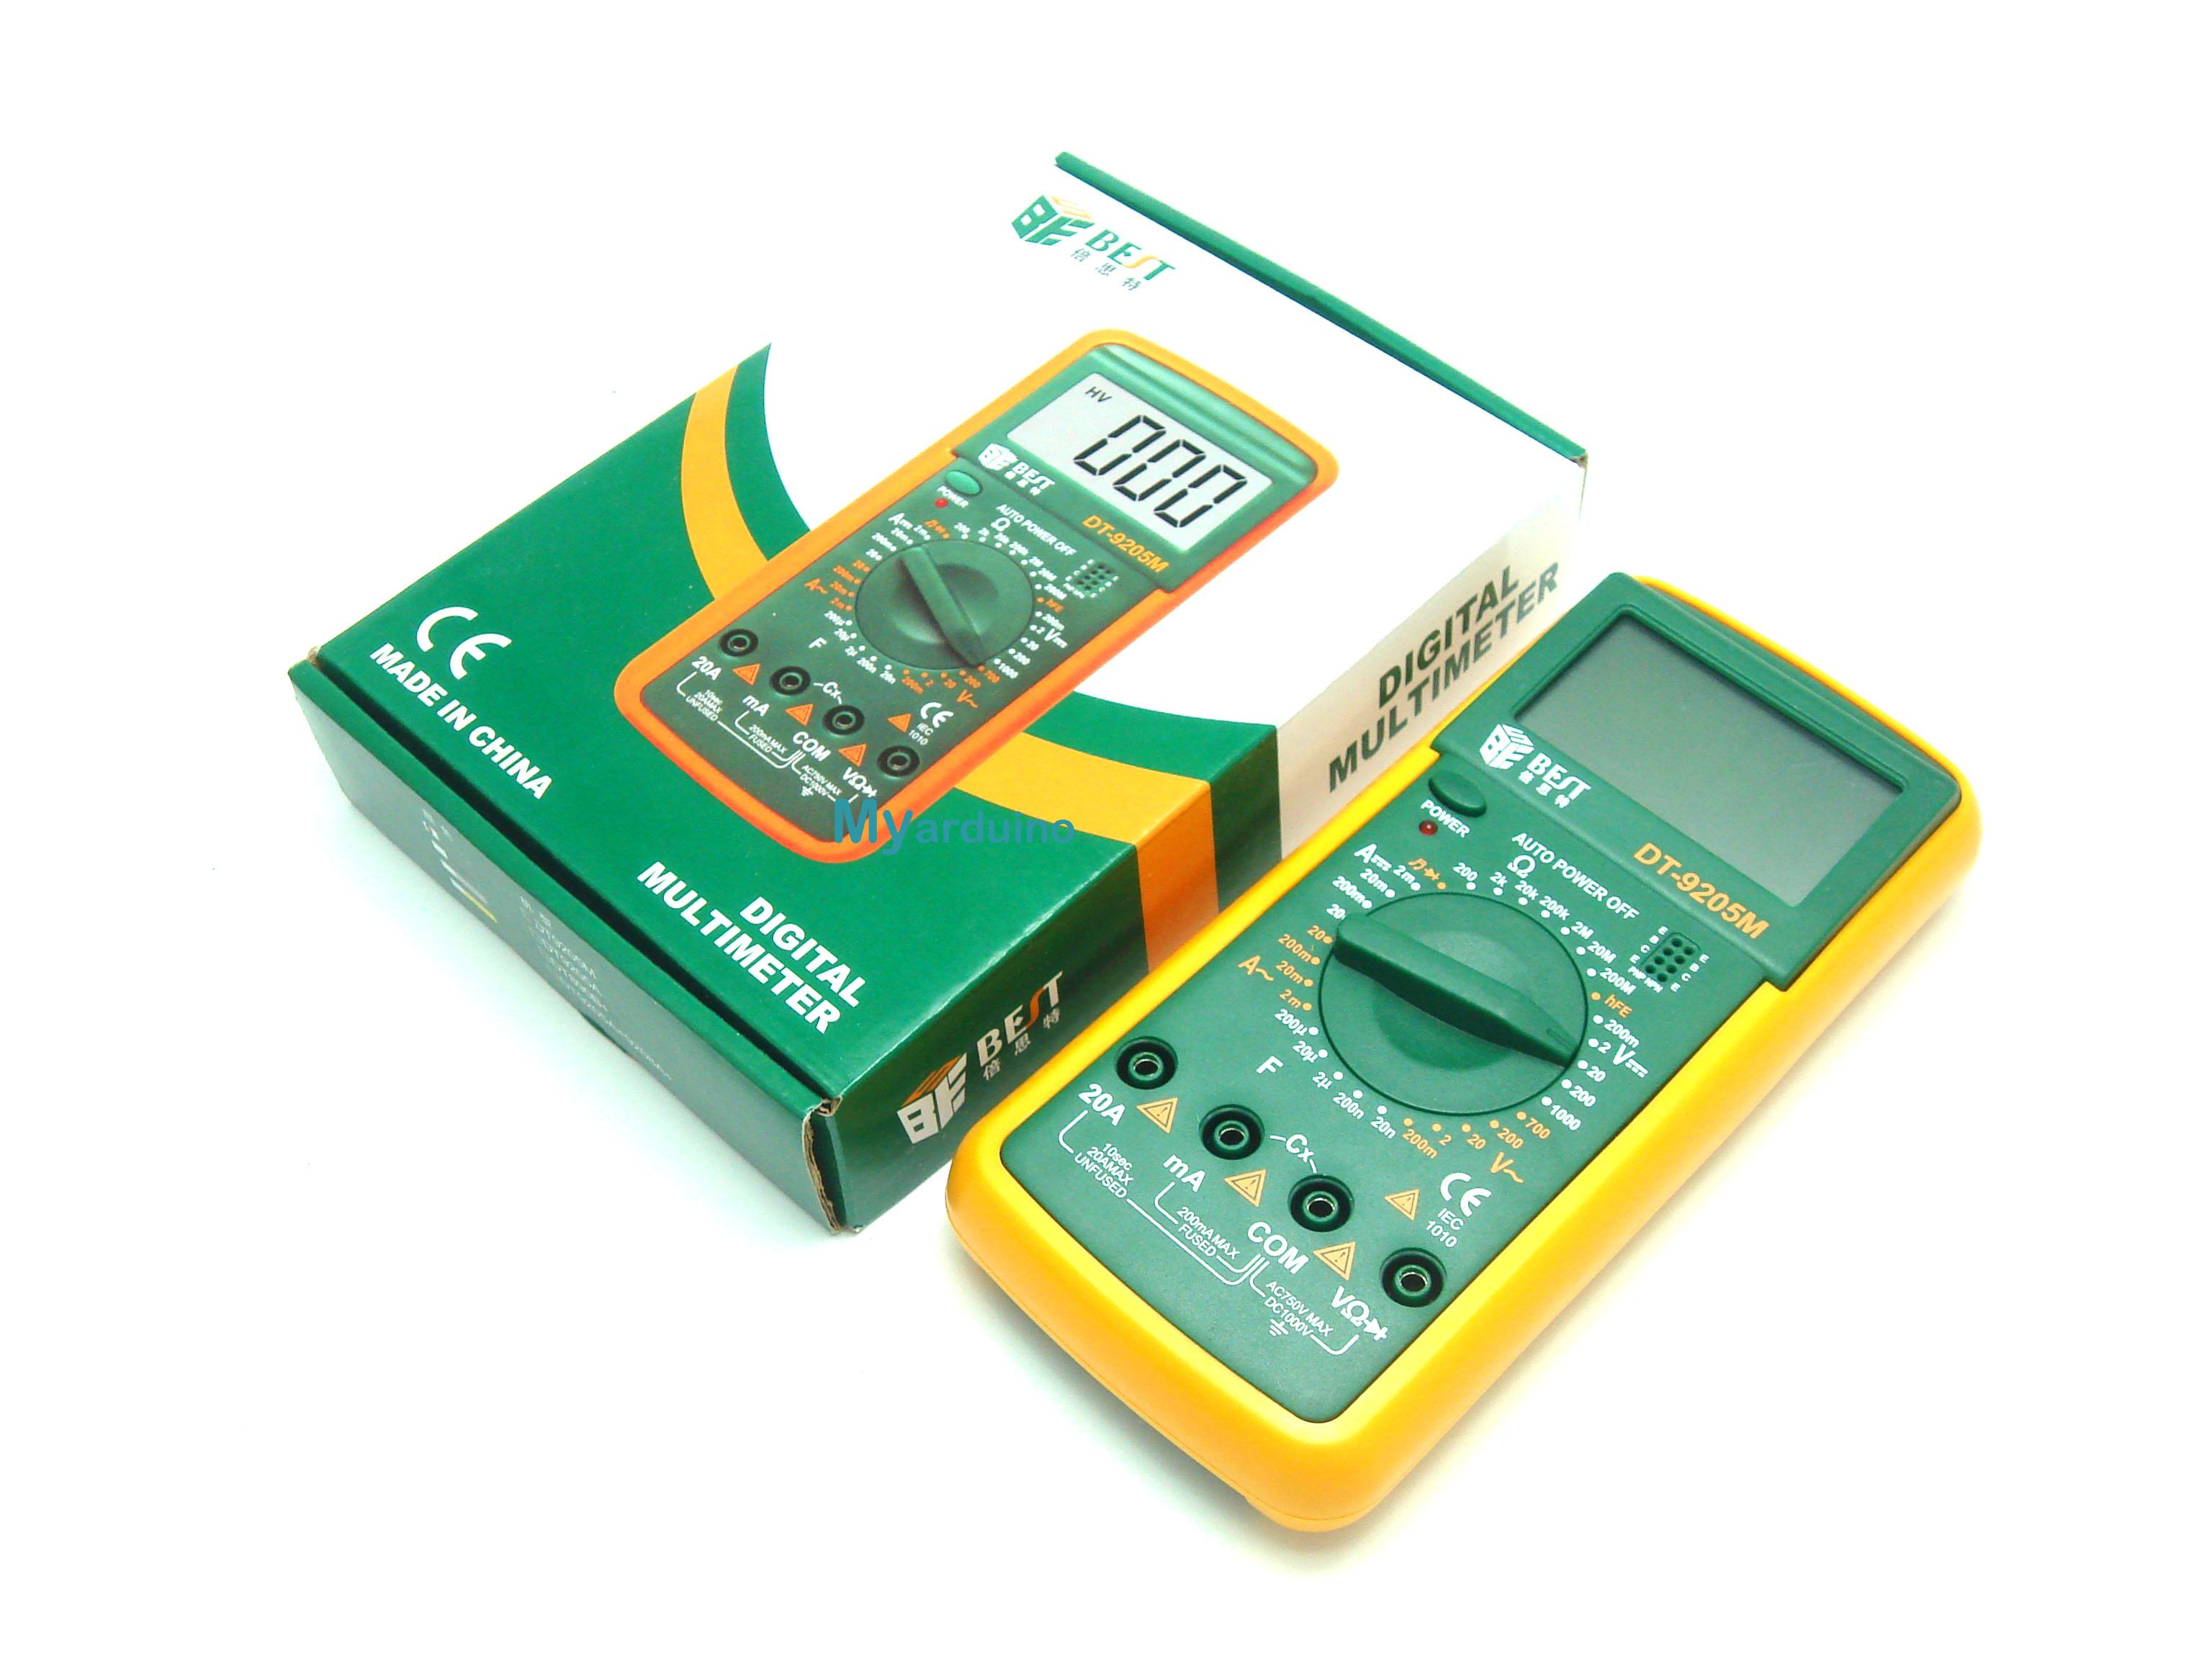 Ke Saier DT9205M LCD Voltmeter Ammeter Ohmmeter Multimeter